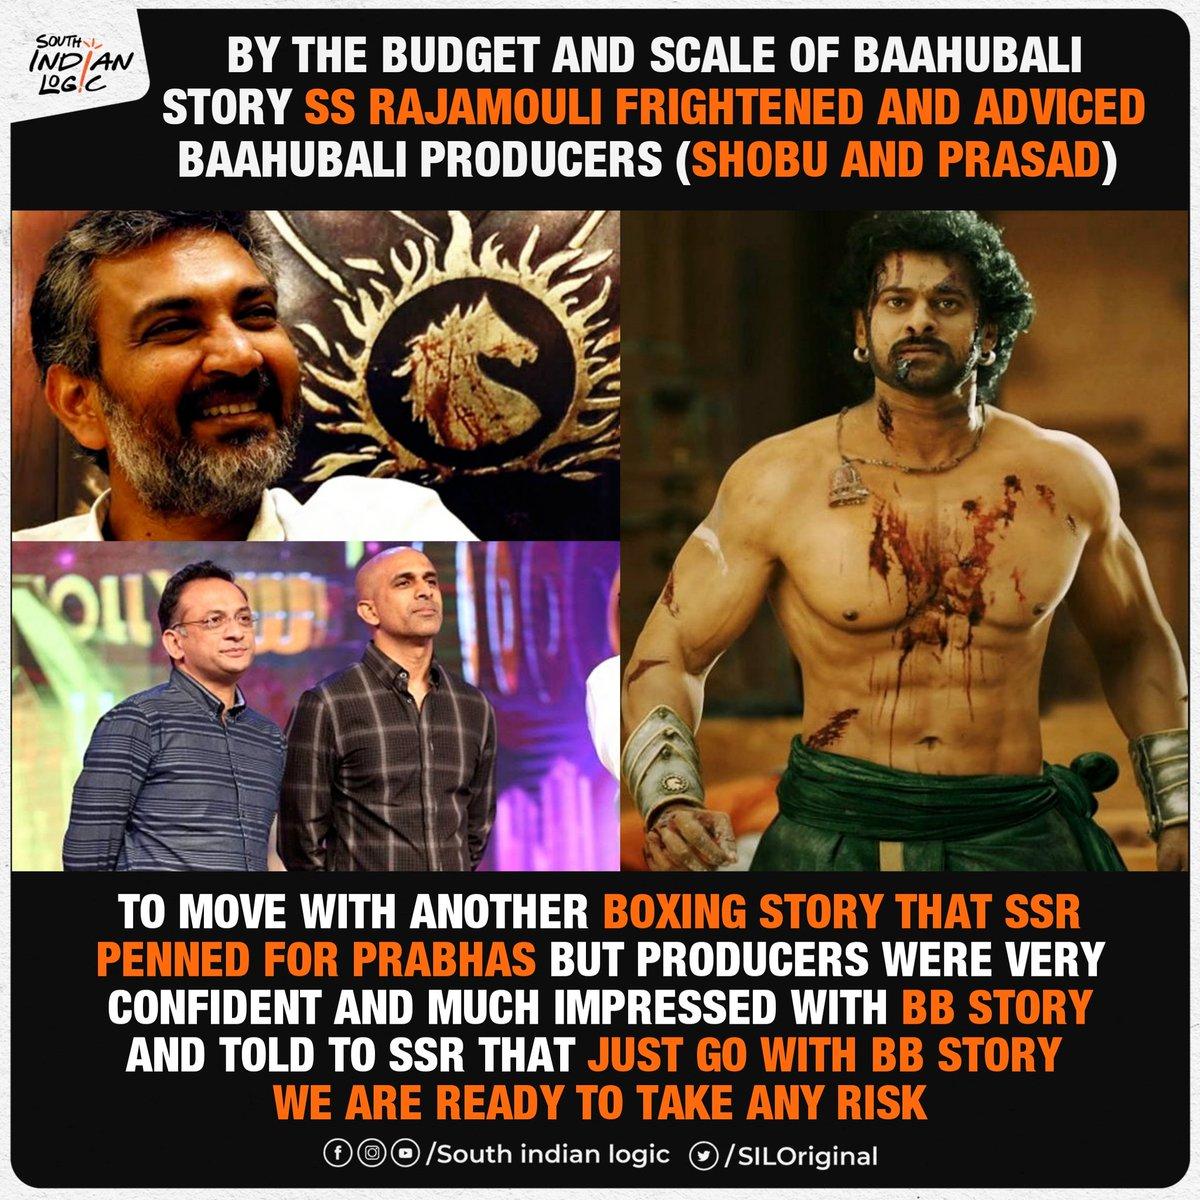 That's how india's biggest blockbuster happened🔥❤️ #Baahubali #ssrajamouli #Prabhas @Shobu_ #PrasadDevineni